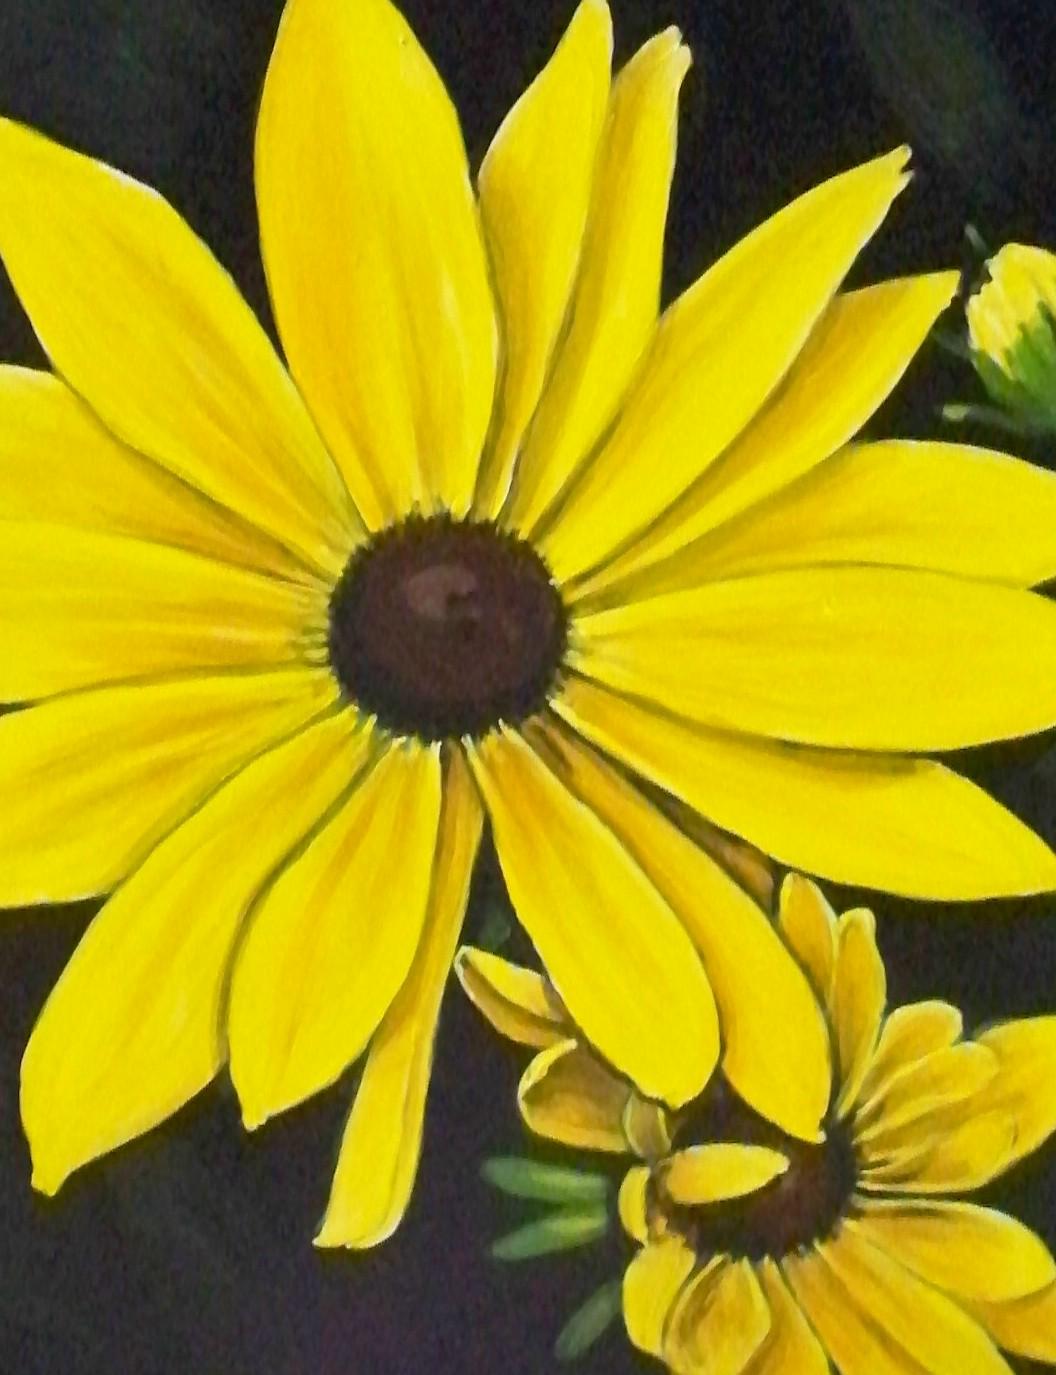 Murals By Marg sunflower2